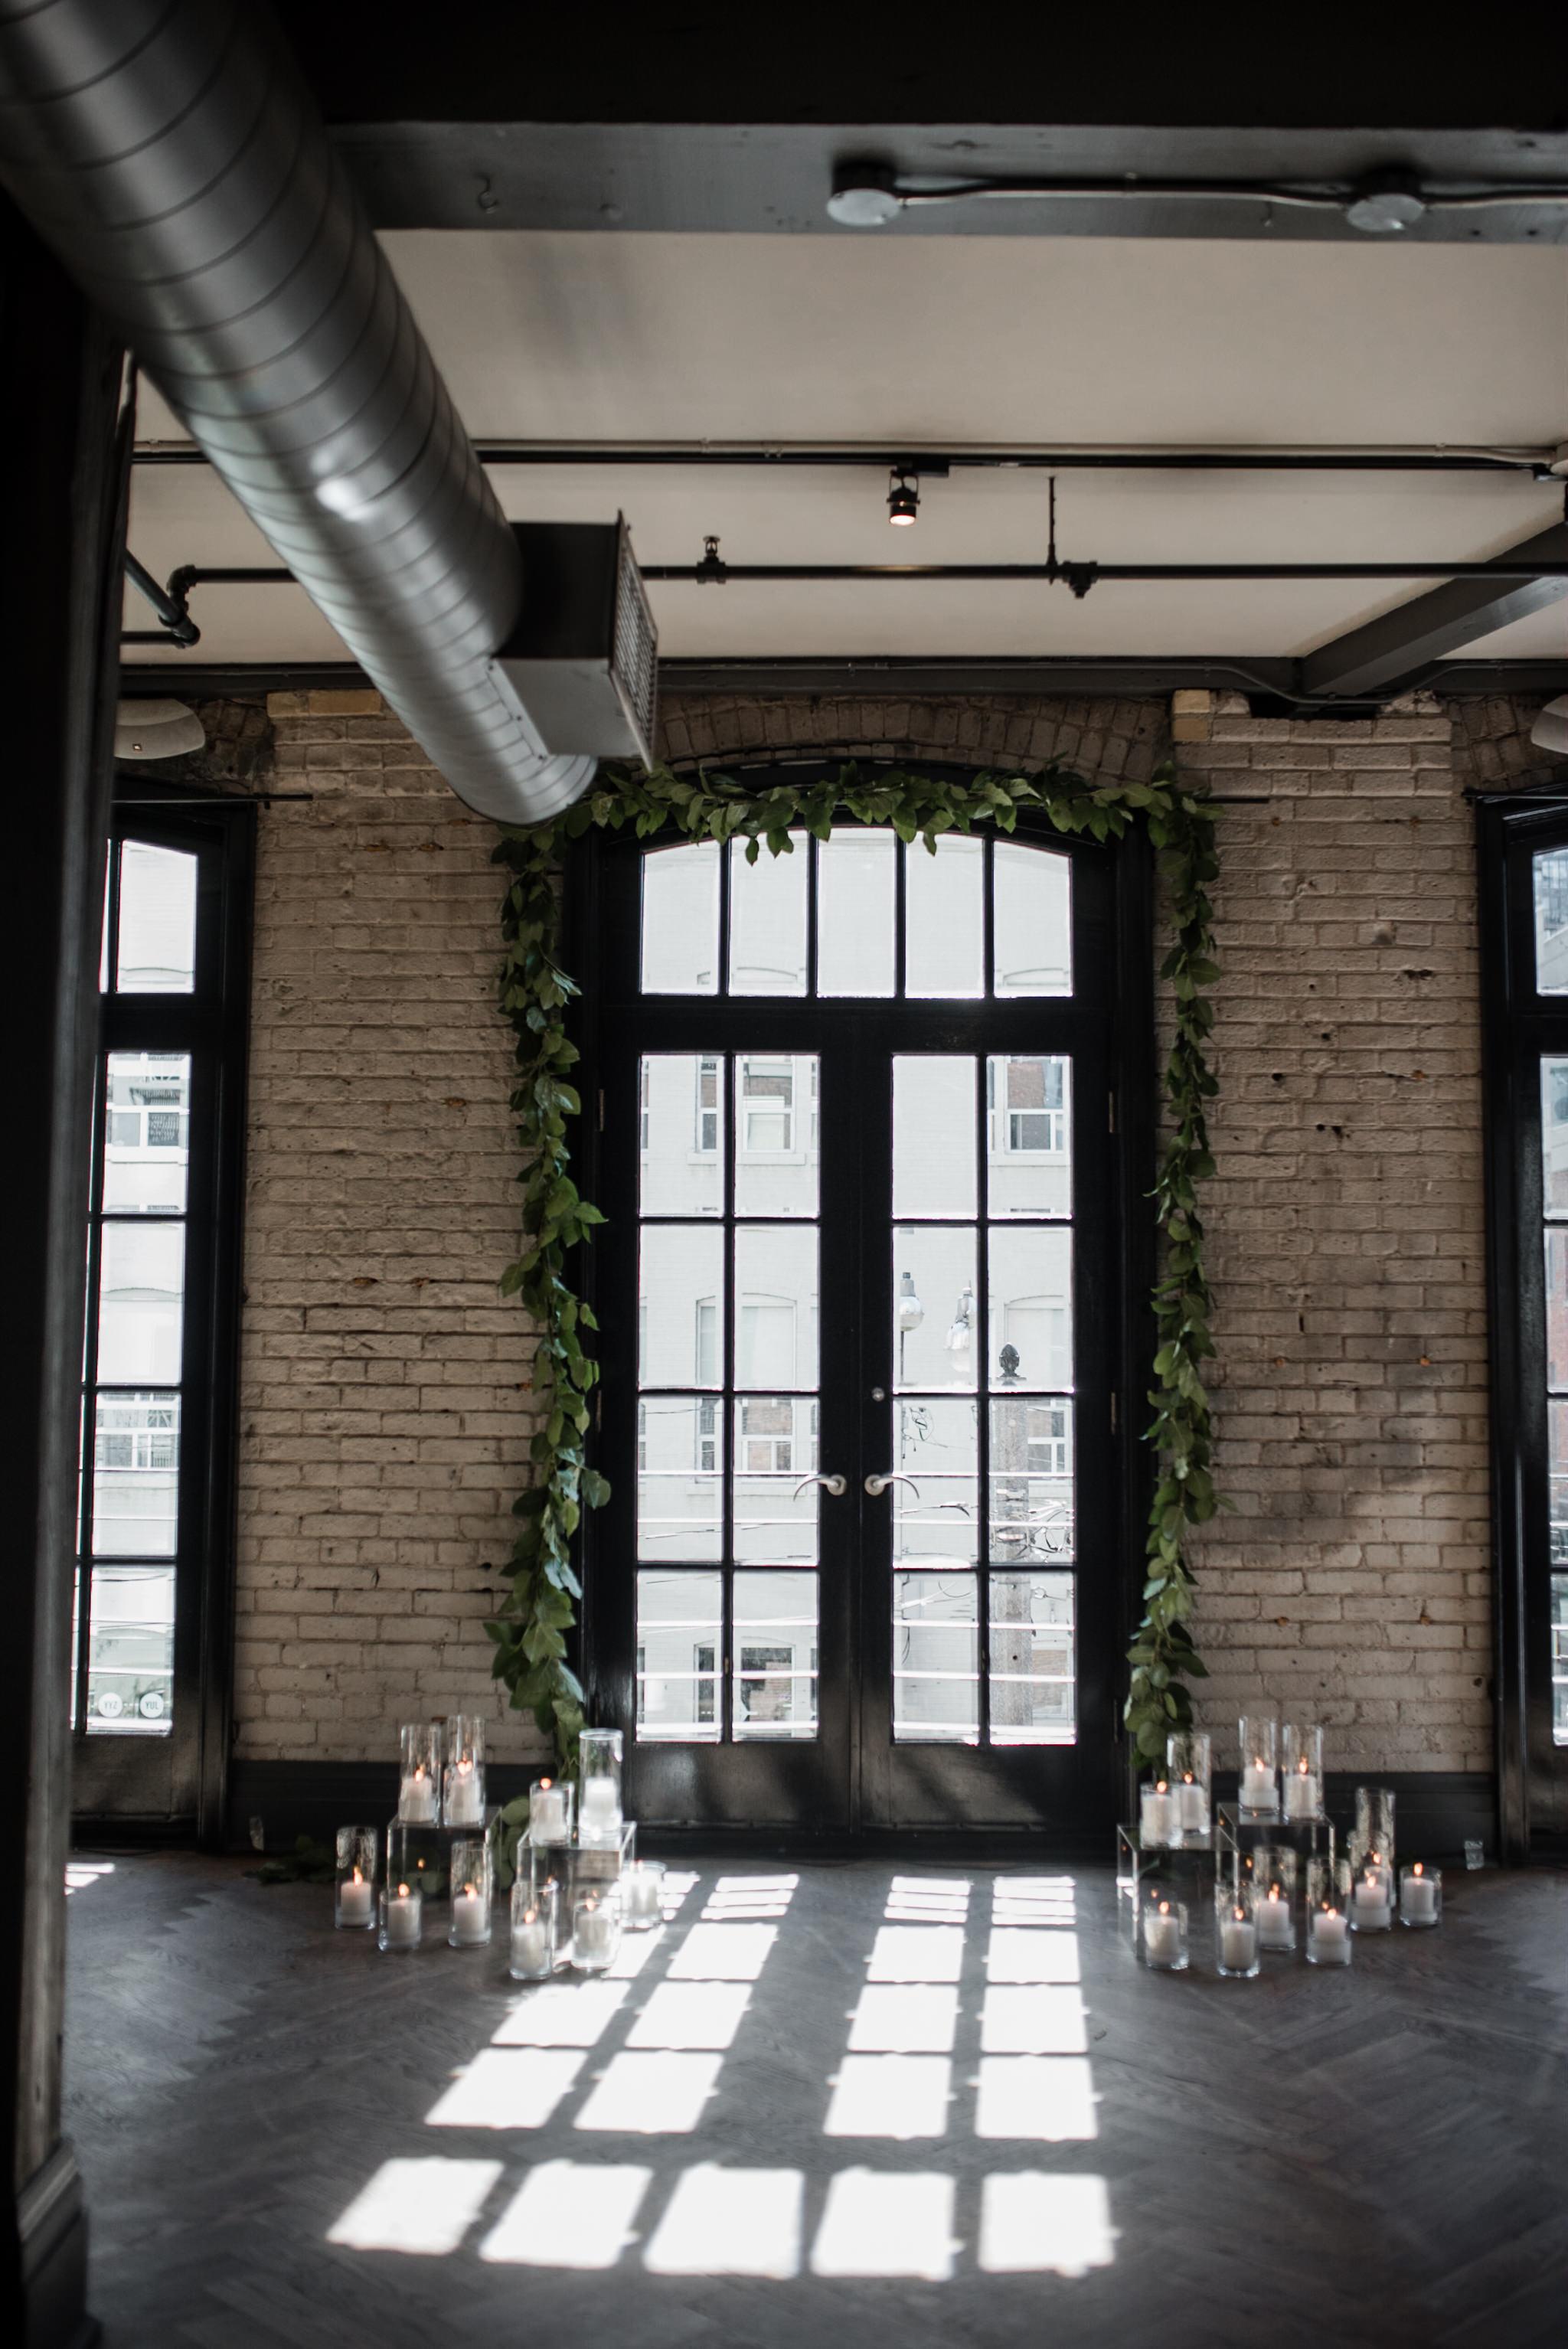 113-wedding-altar-decor-storys-building-candles-garland-industrial.jpg